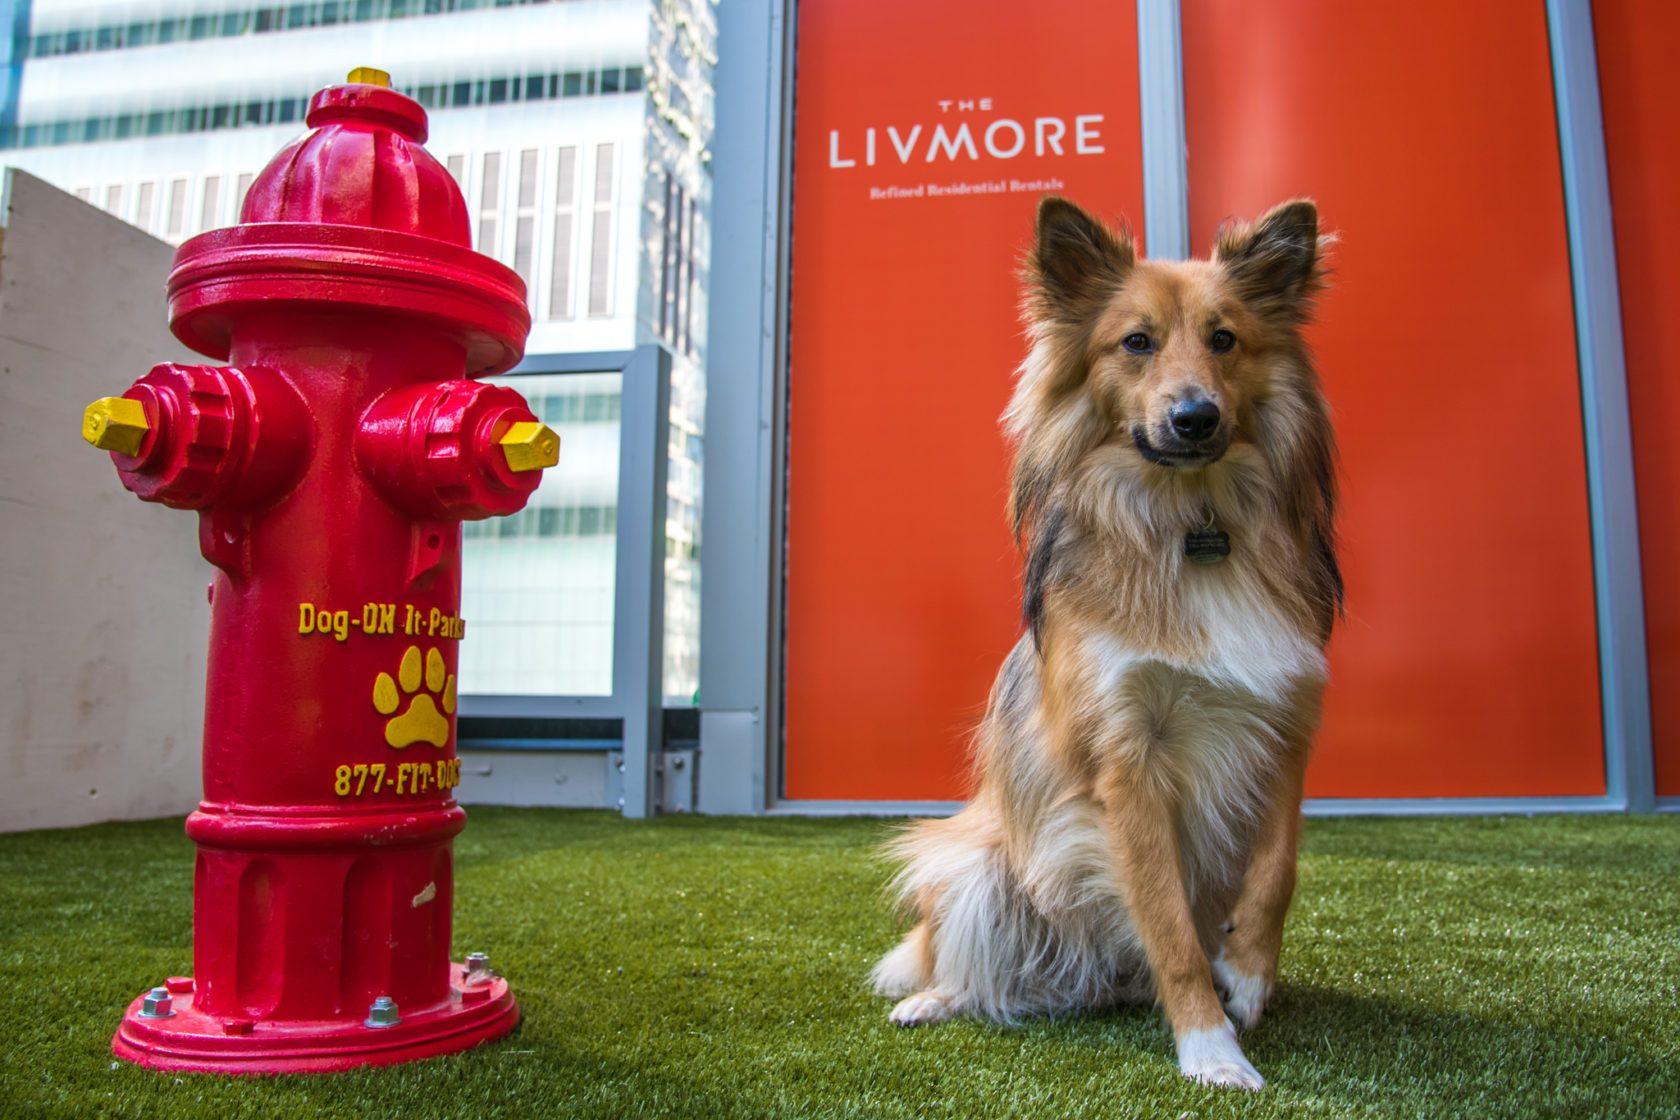 The Livmore amenities - outdoor dog areaa